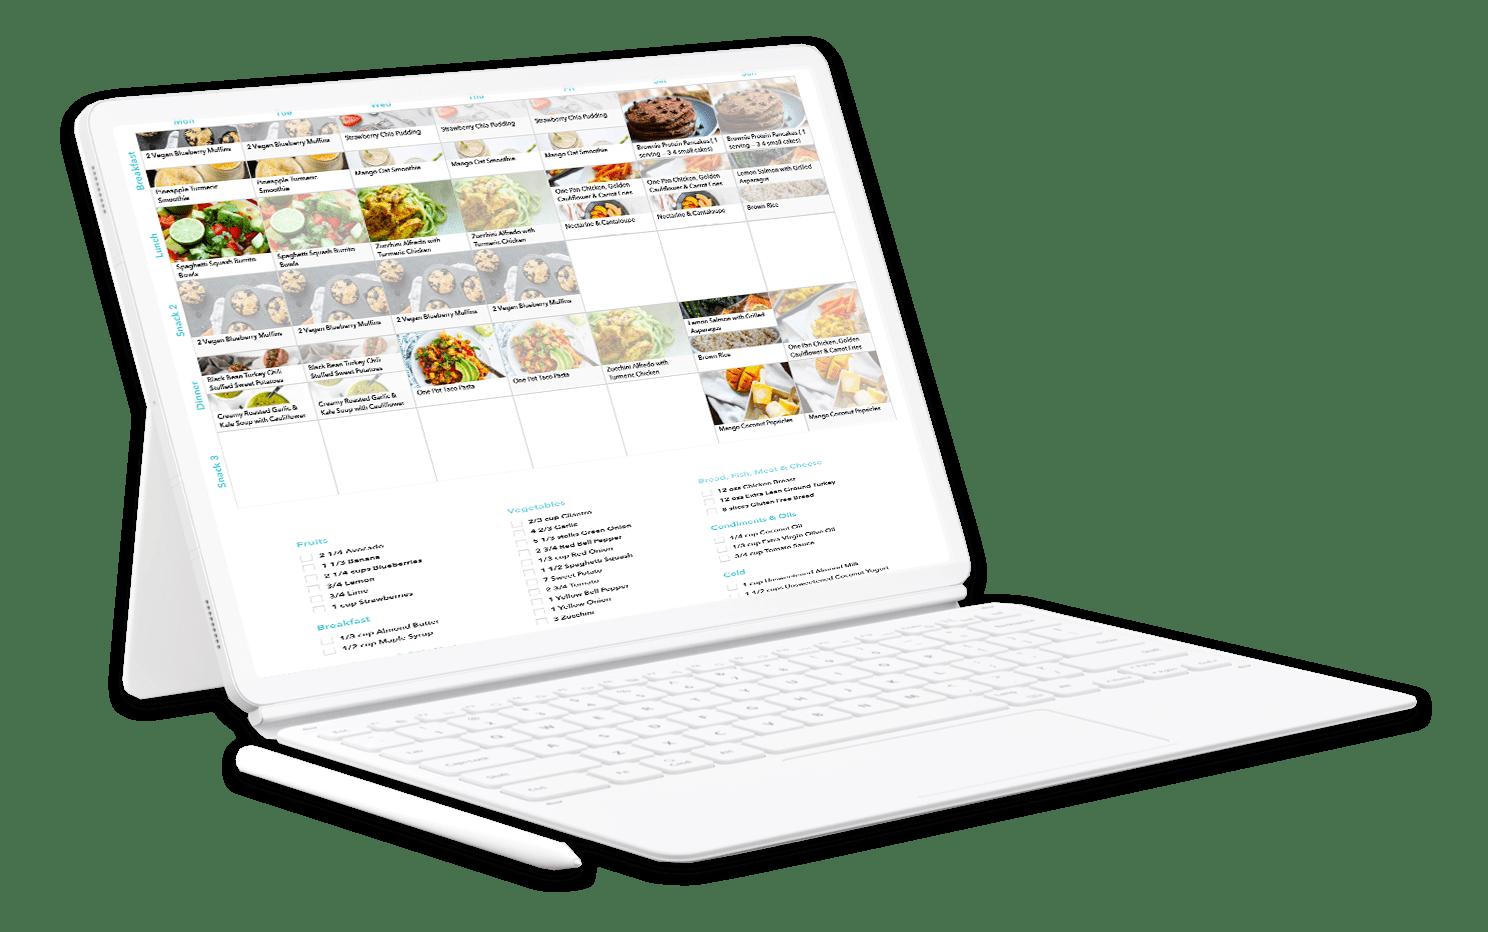 Weekly meal plan shown in laptop